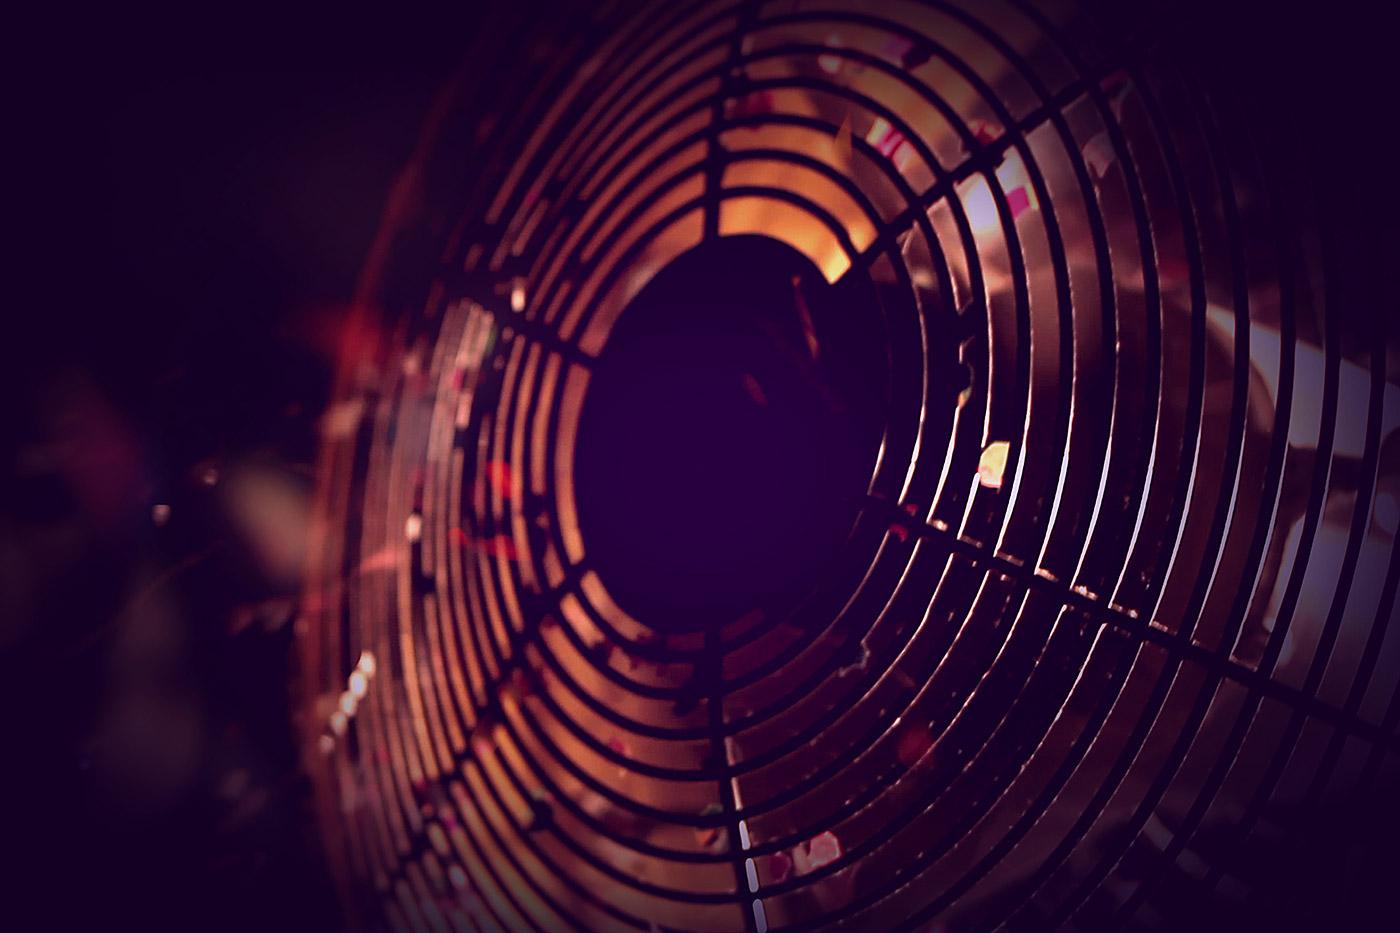 swing-vr-virtual-reality-turbo-boost-wind-machine_confetti